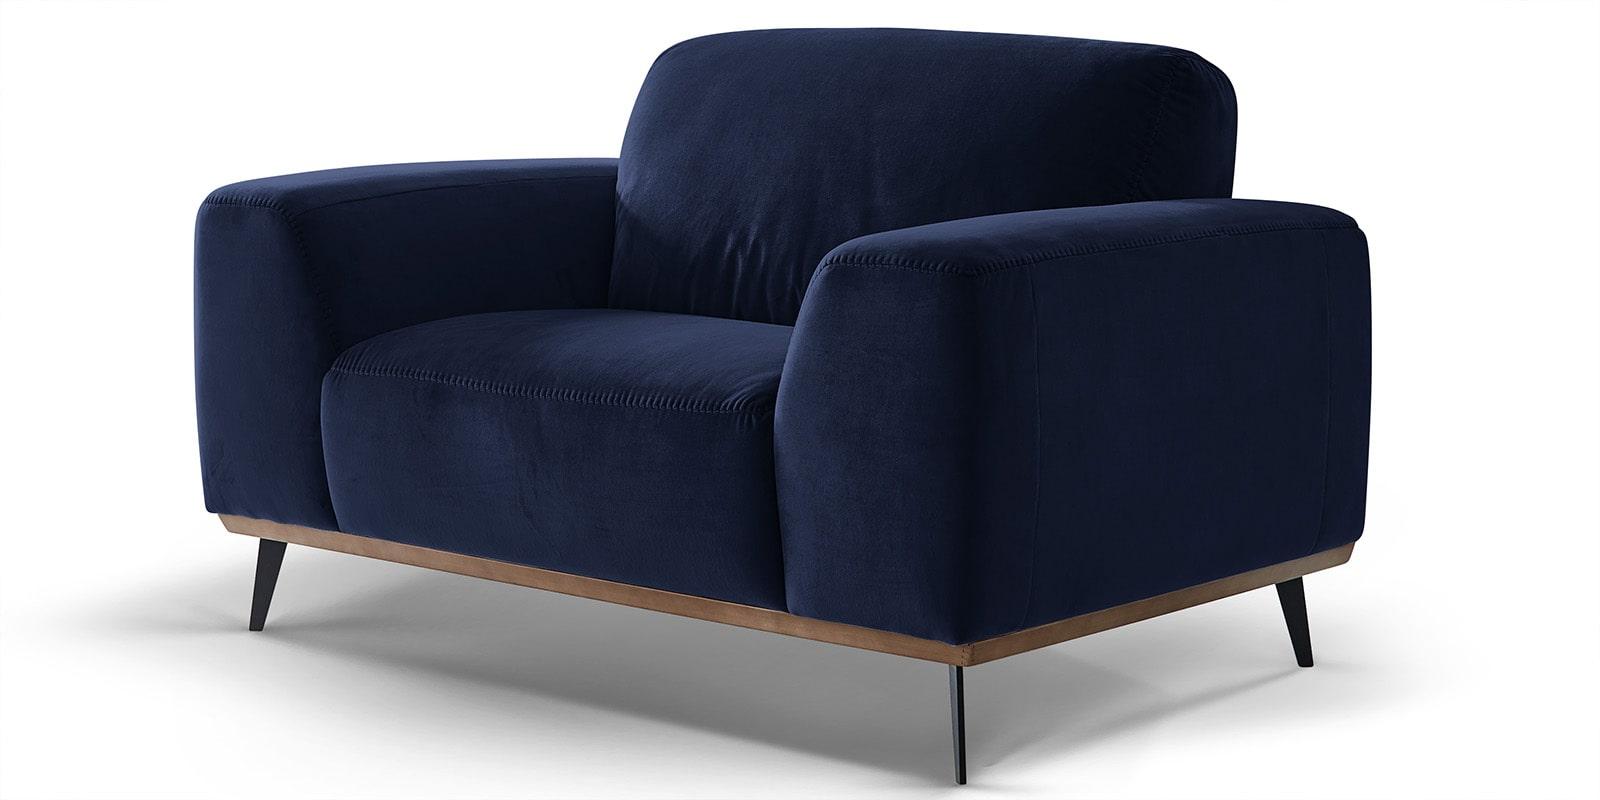 Moebella24 - 1-Sitzer - Sofa - Sessel - Barcelona - Samt - Dunkelblau - Skandinavisches - Design - Punto - cavallo - Nähte - Detailaufnahme